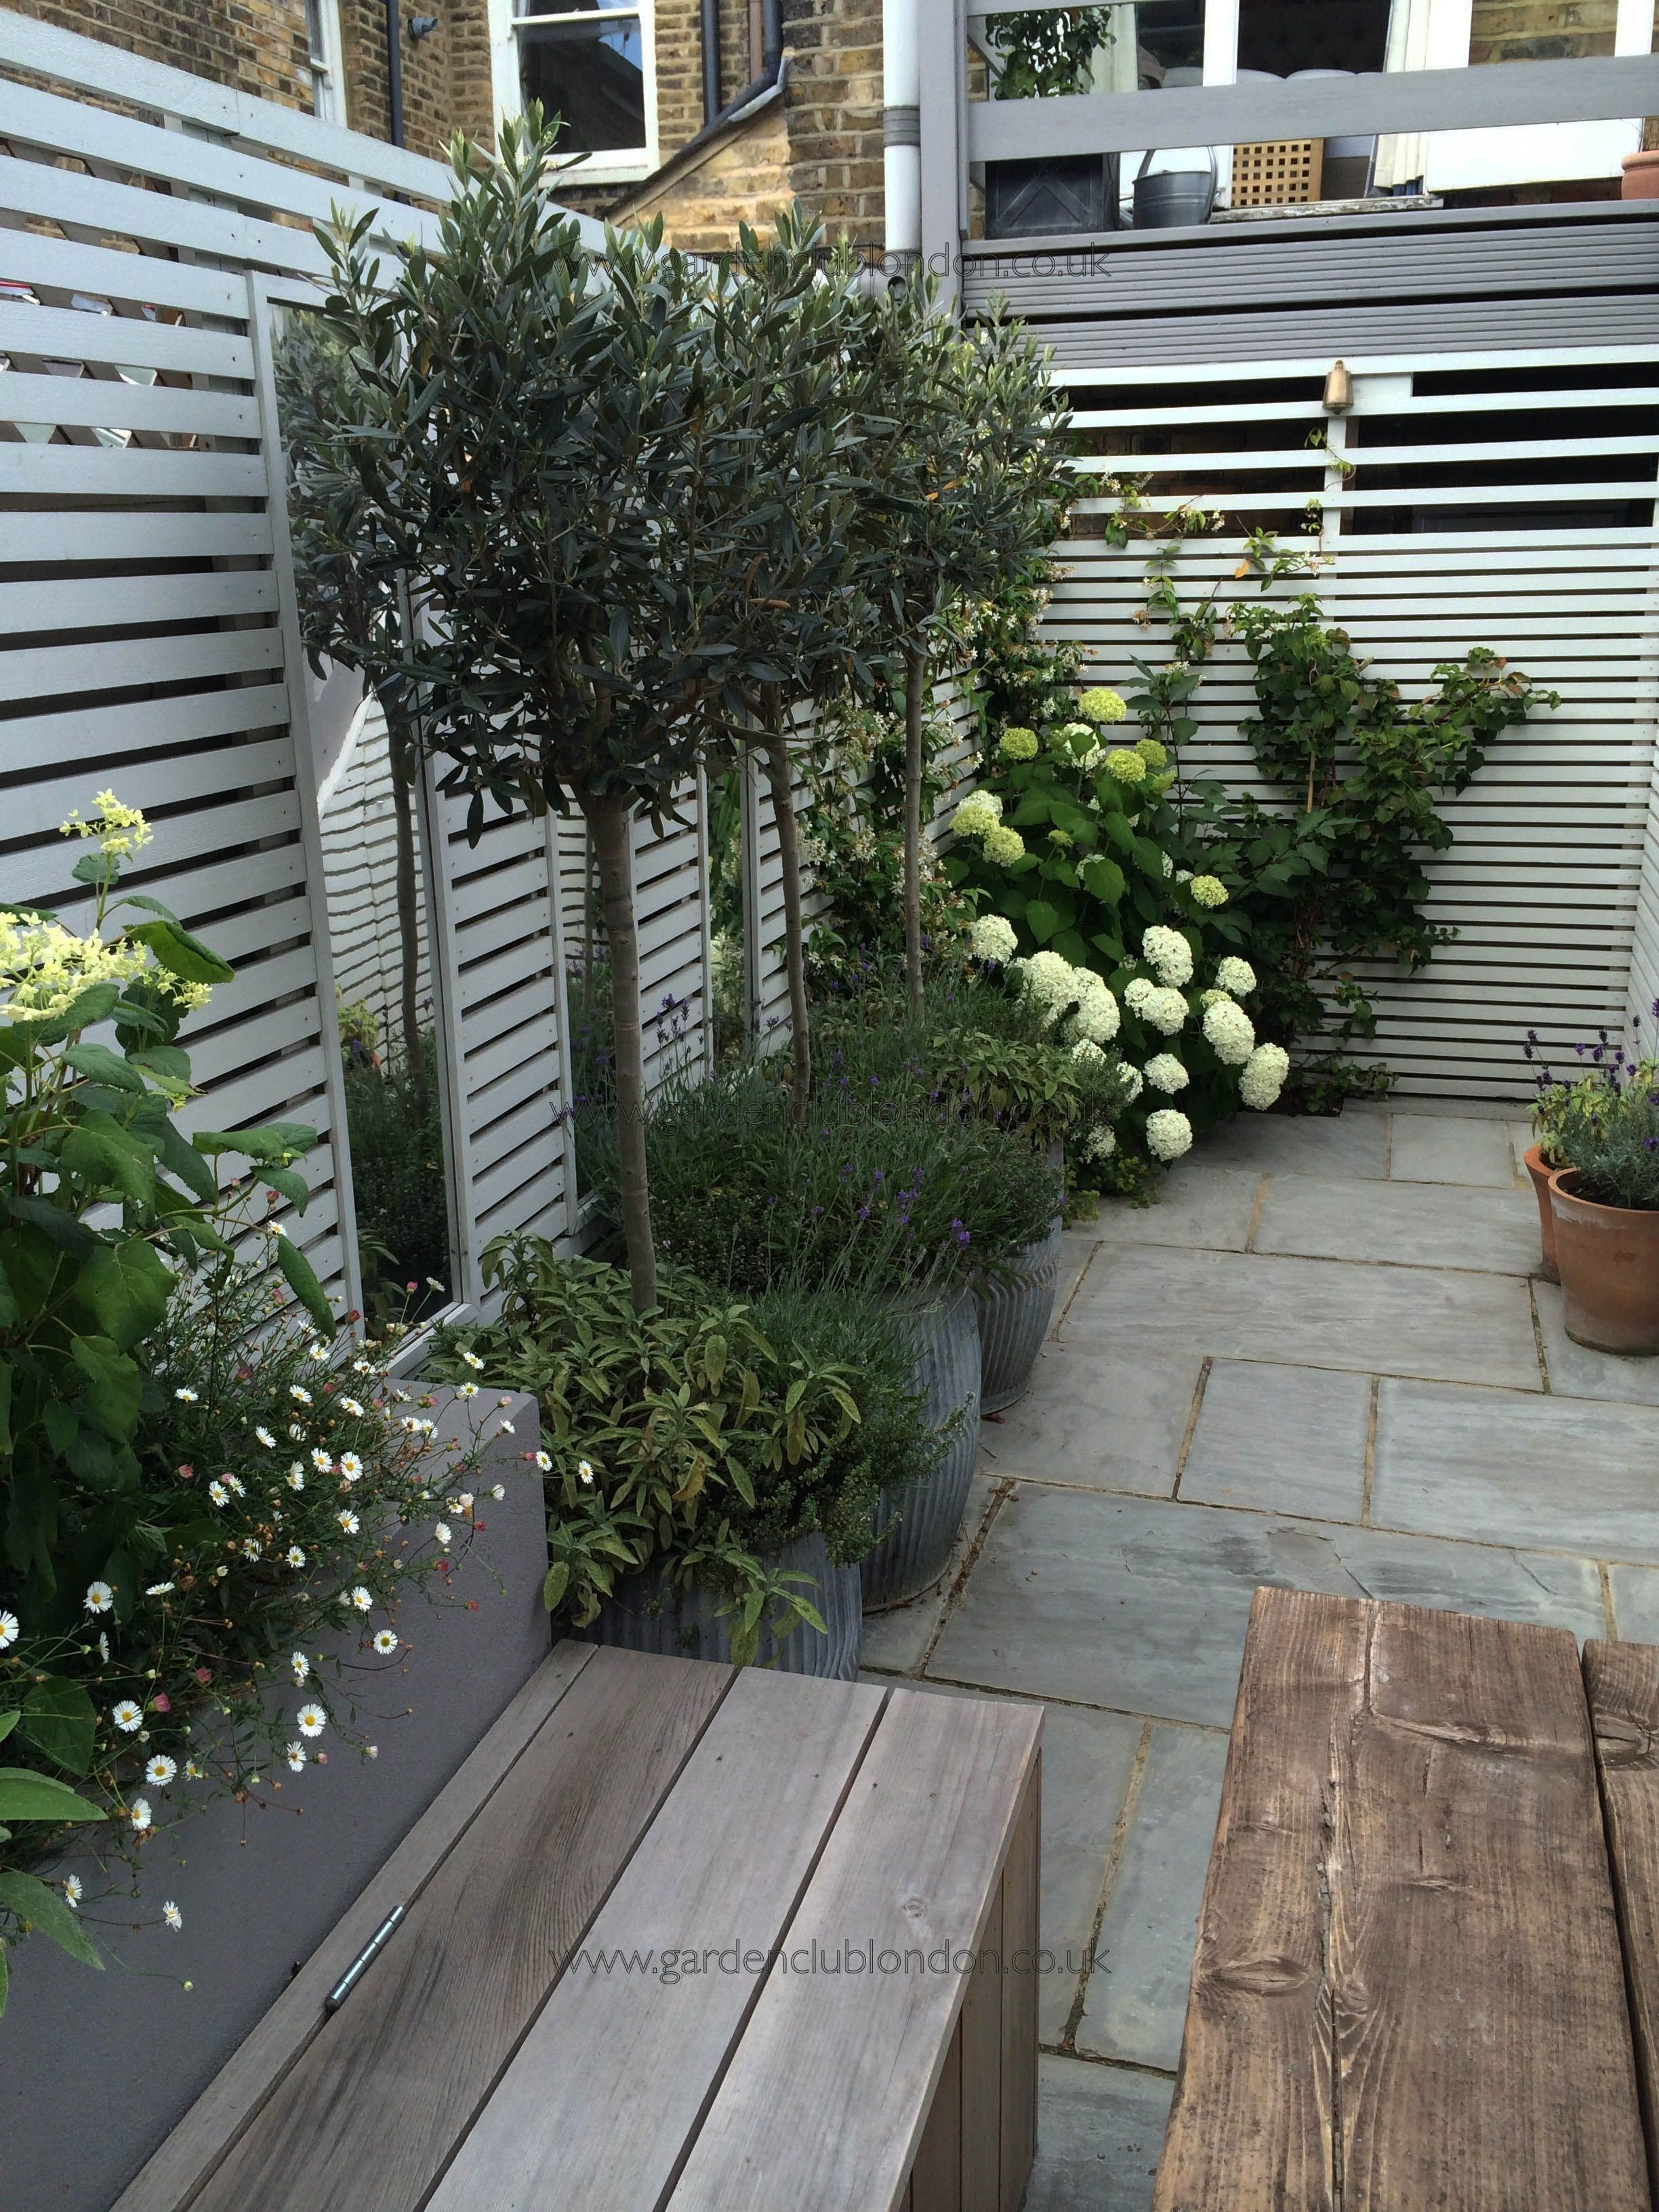 Top Very Small Condo Patio Ideas Exclusive On Smarthomefi Com Urban Garden Design Small Urban Garden Design Small Urban Garden